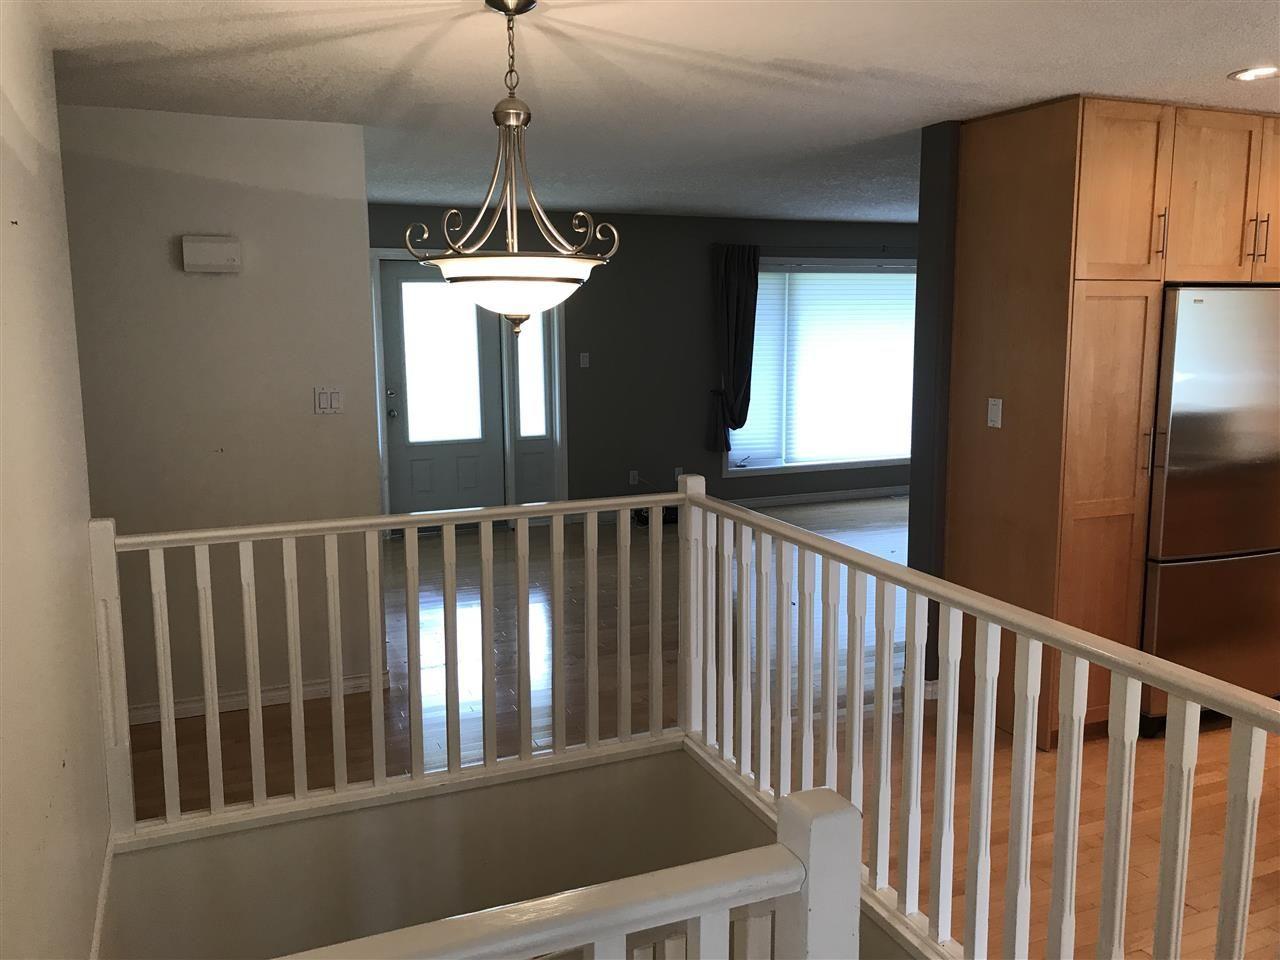 Photo 10: Photos: 9813 269 Road in Fort St. John: Fort St. John - Rural W 100th House for sale (Fort St. John (Zone 60))  : MLS®# R2208403